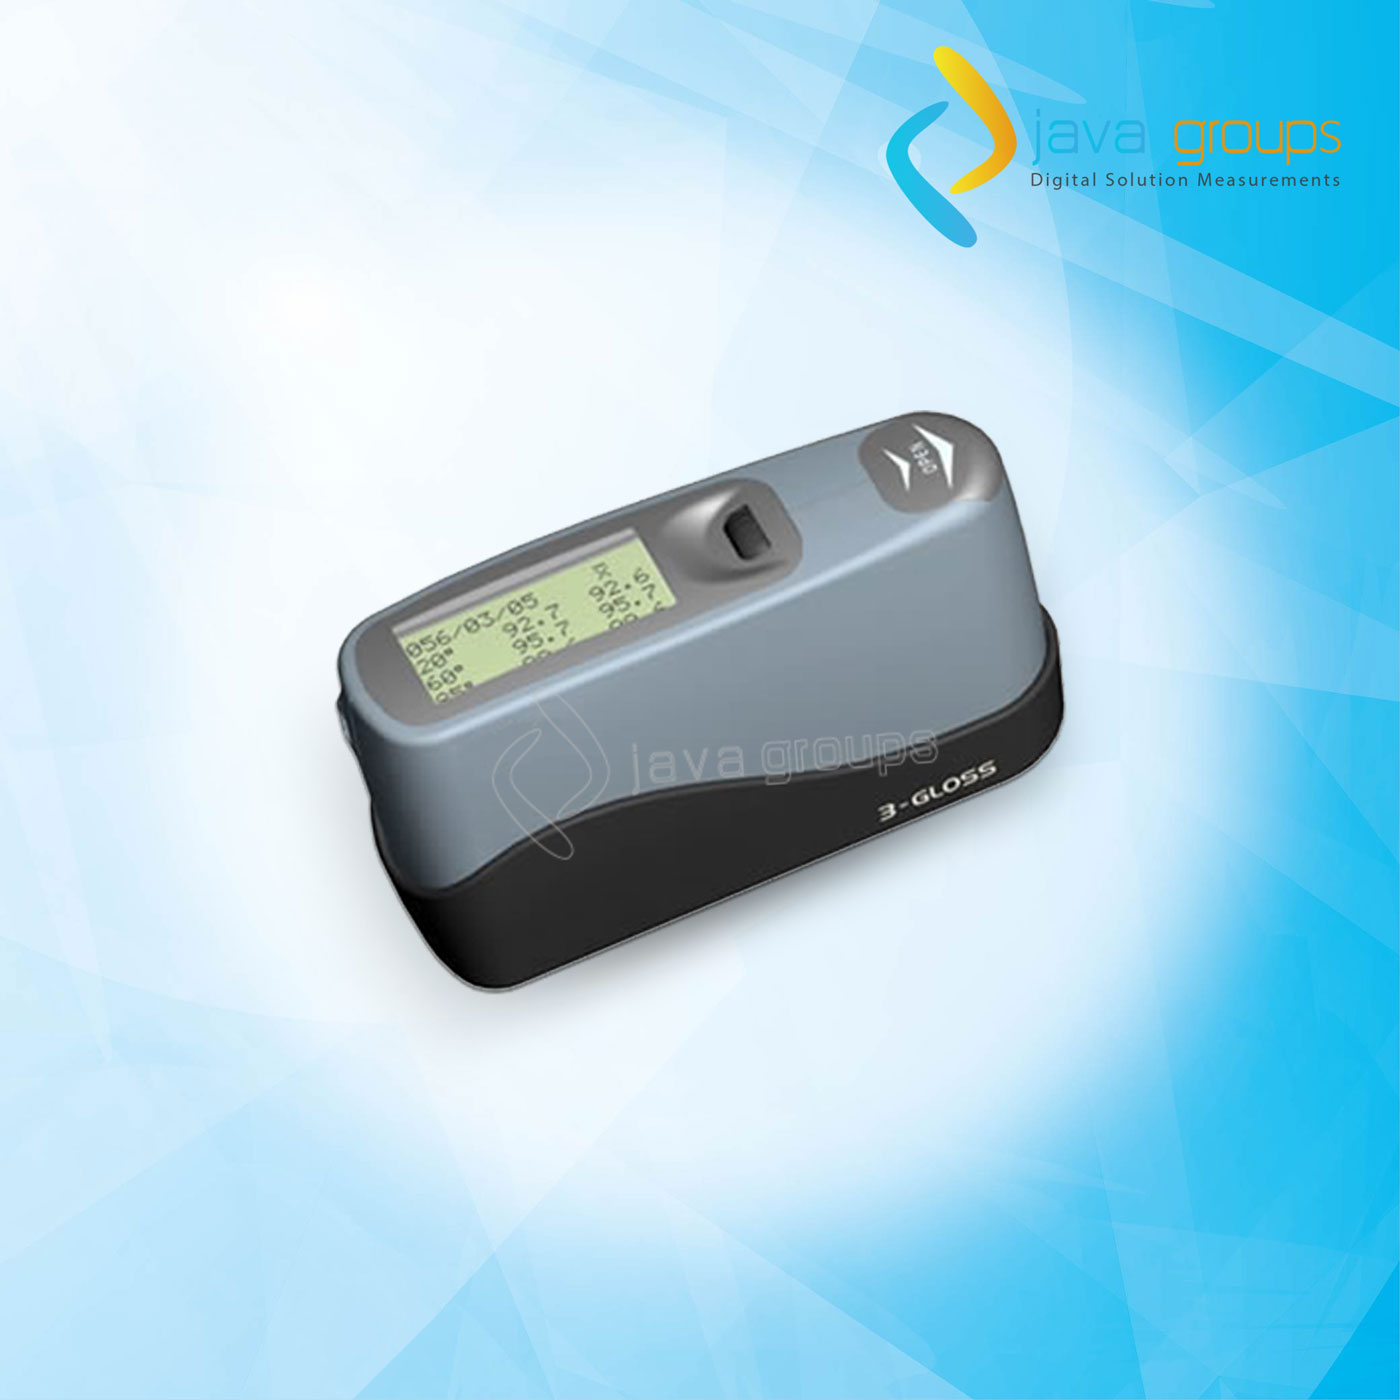 Alat Pengukur Kilapan 3 Angles Gloss meter Seri MG268-F2